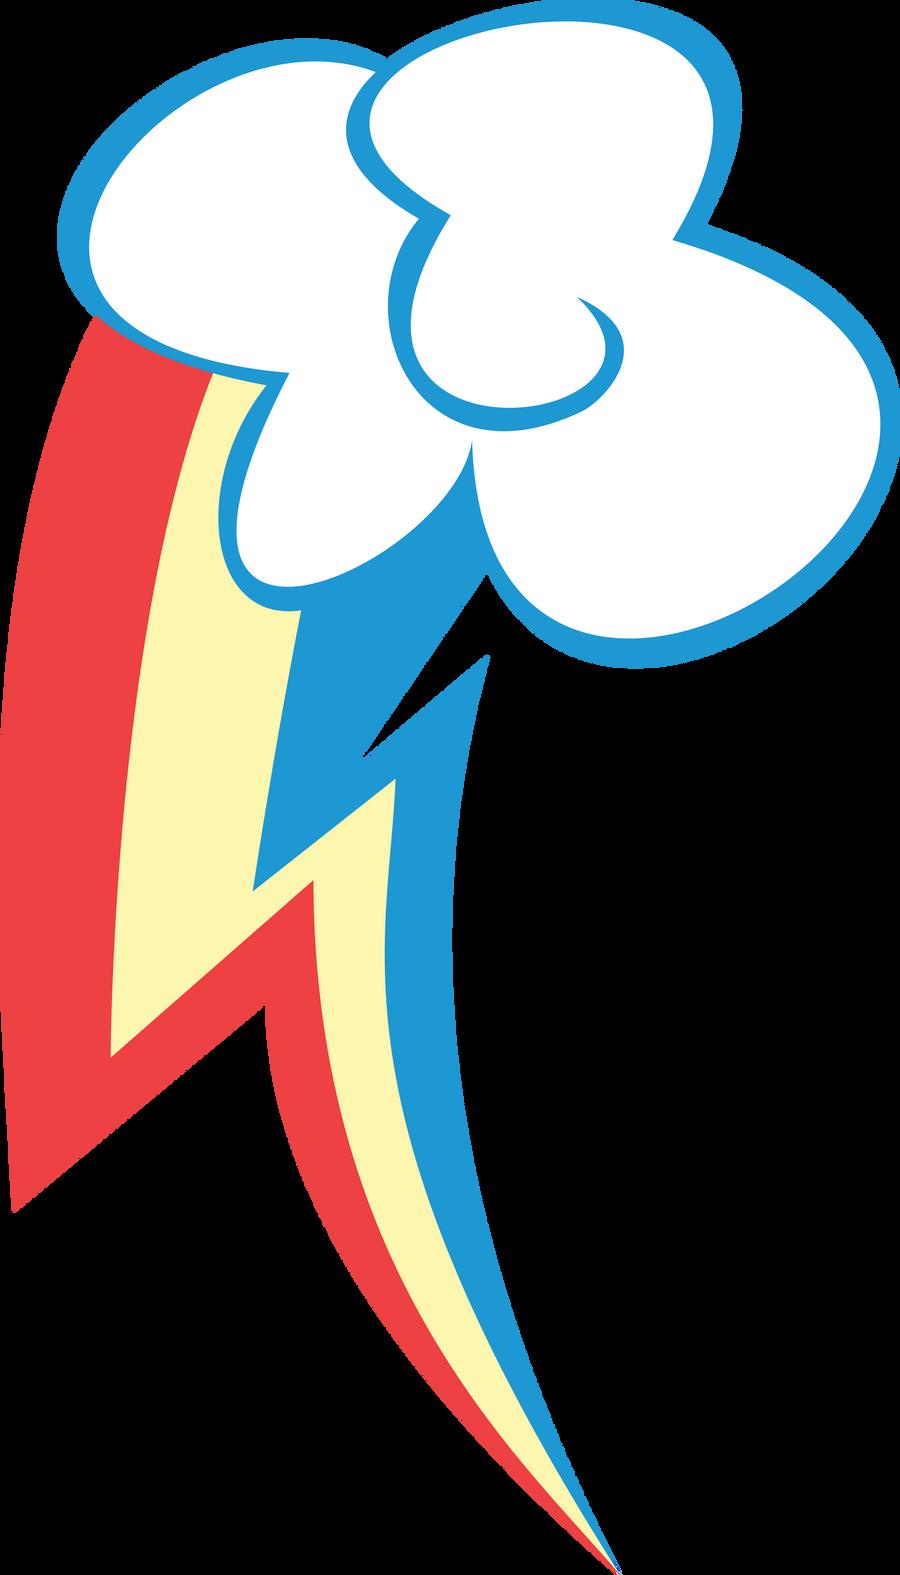 Rainbow Dash Cutie Mark by LunaBubble-Ede96 on DeviantArt